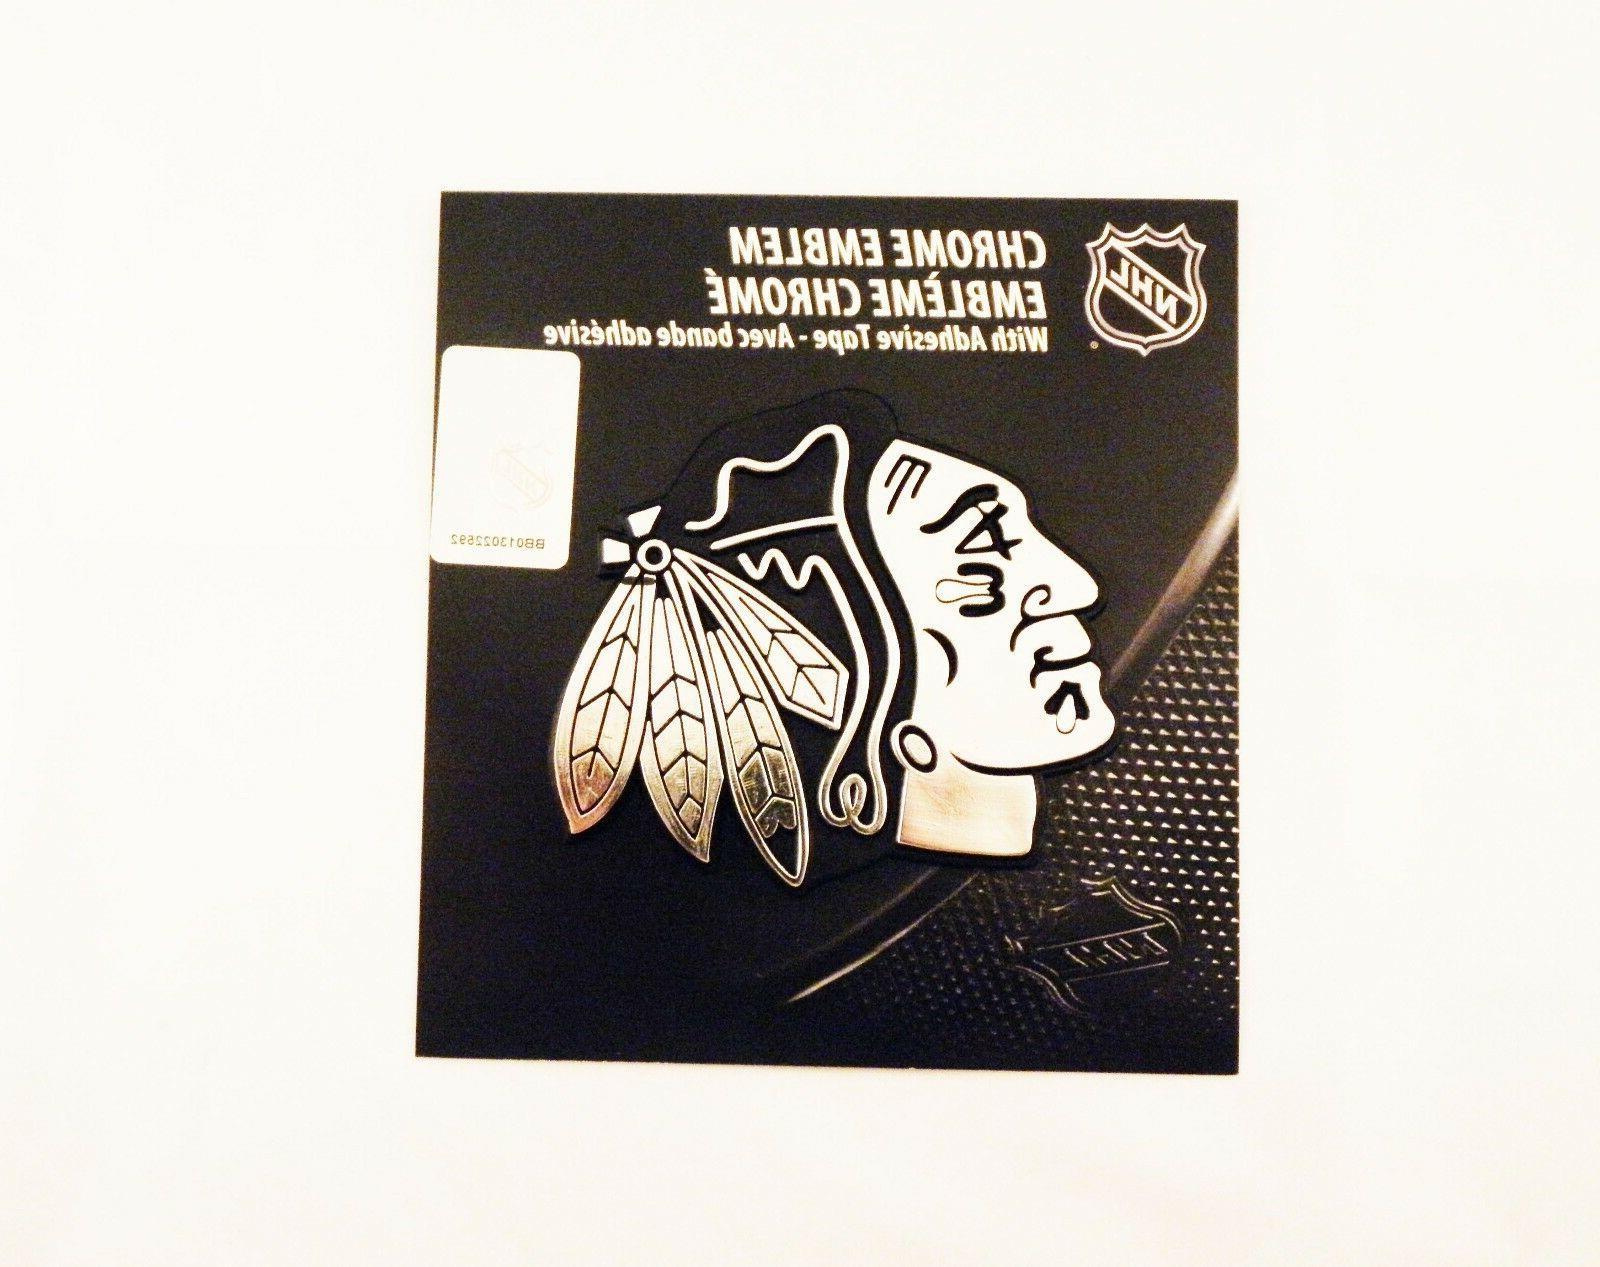 nhl chicago blackhawks chrome emblem